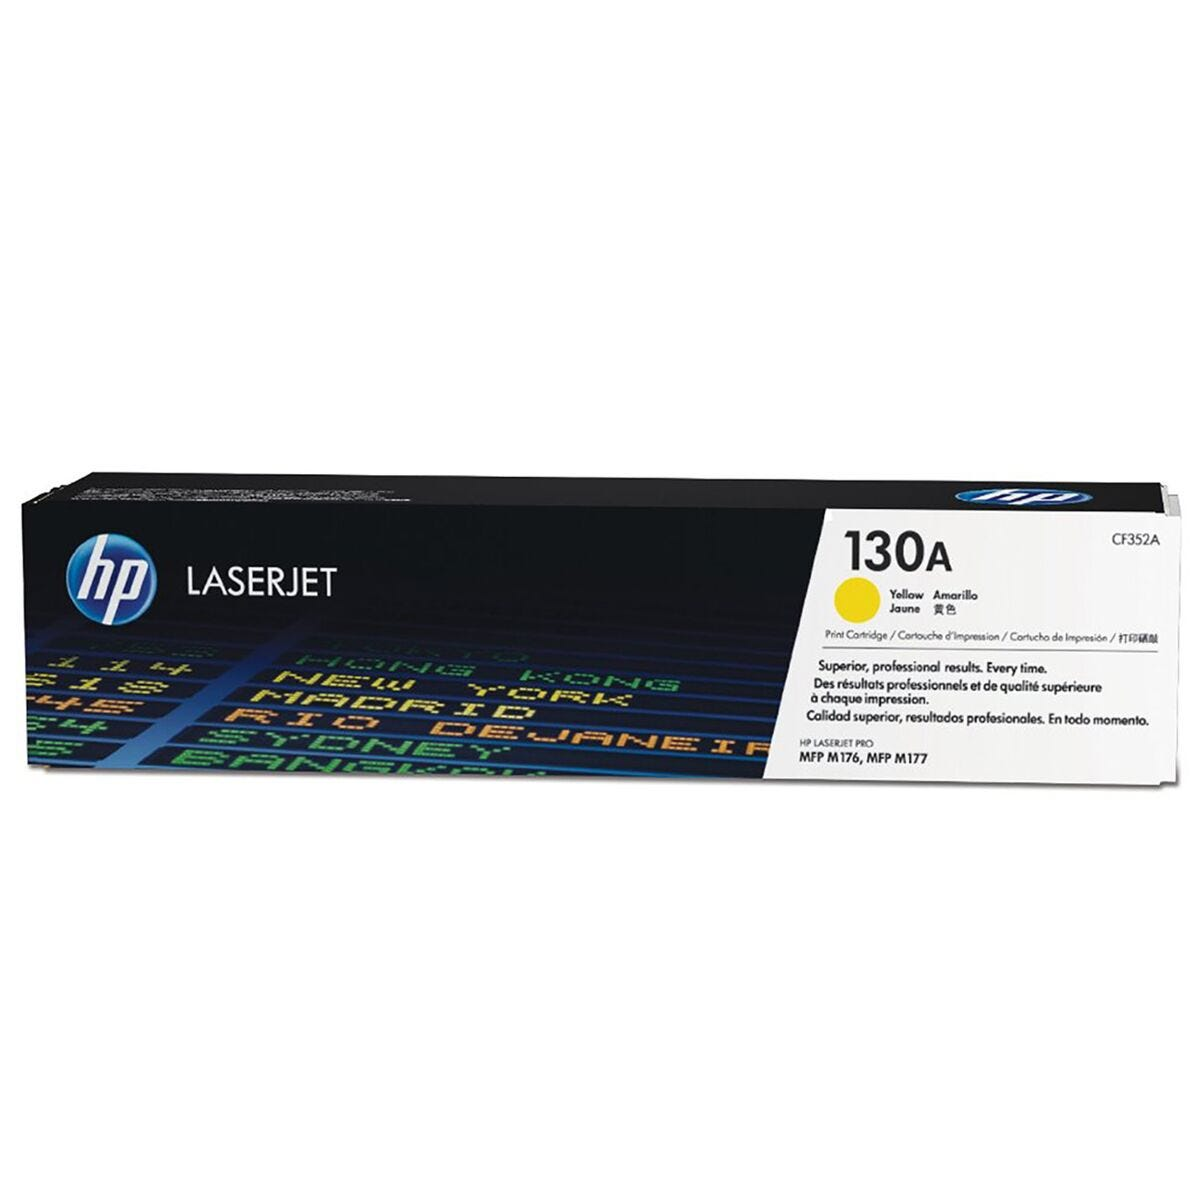 HP 130A Laser Toner Yellow